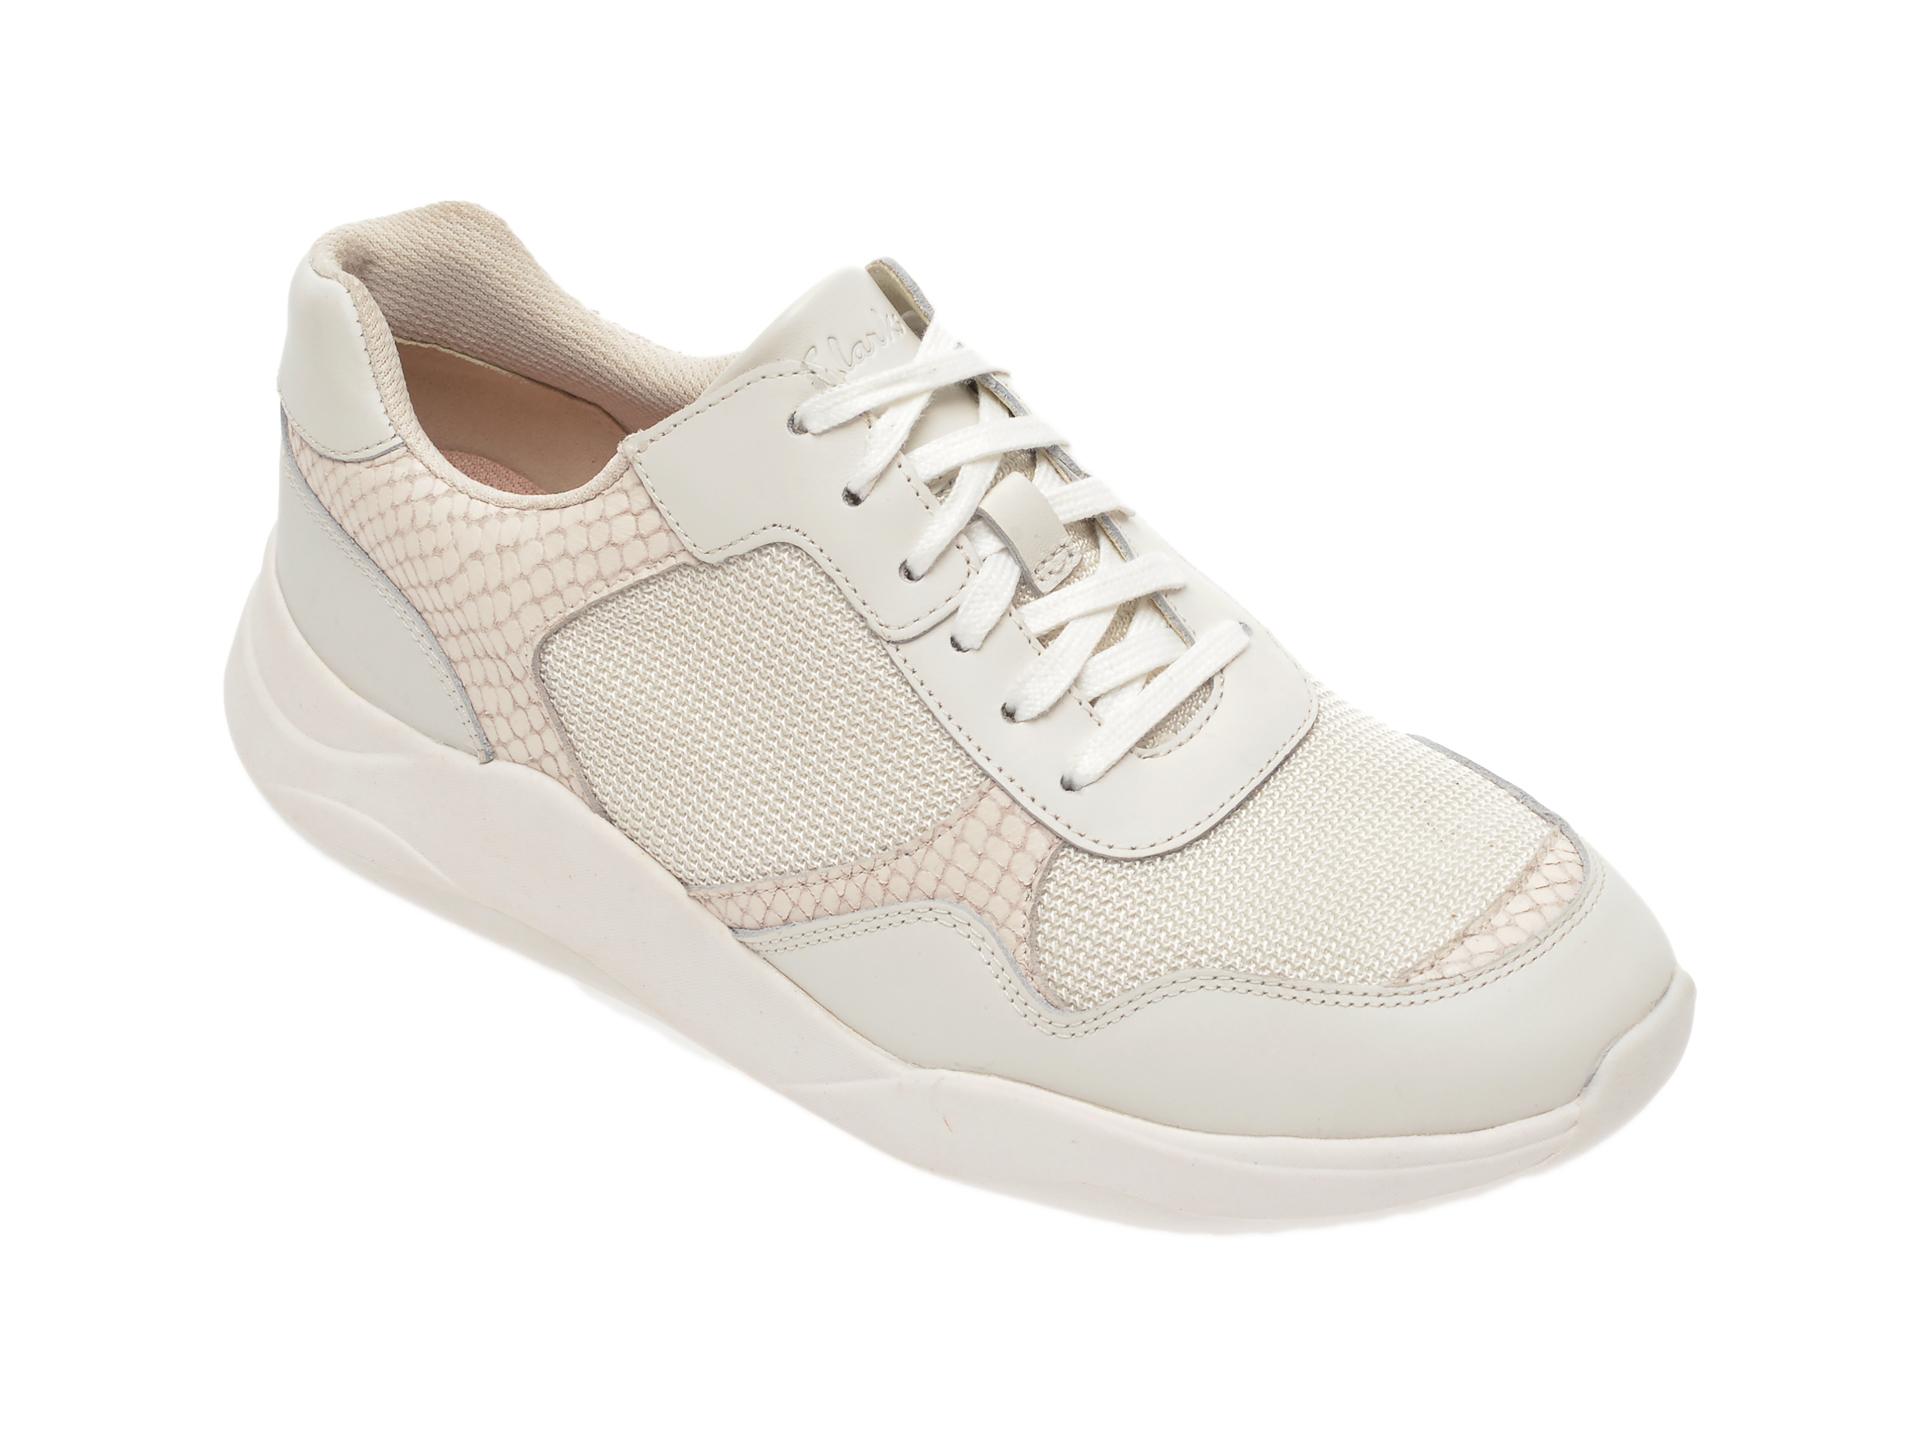 Pantofi sport CLARKS albi, Sift Lace, din material textil si piele naturala New